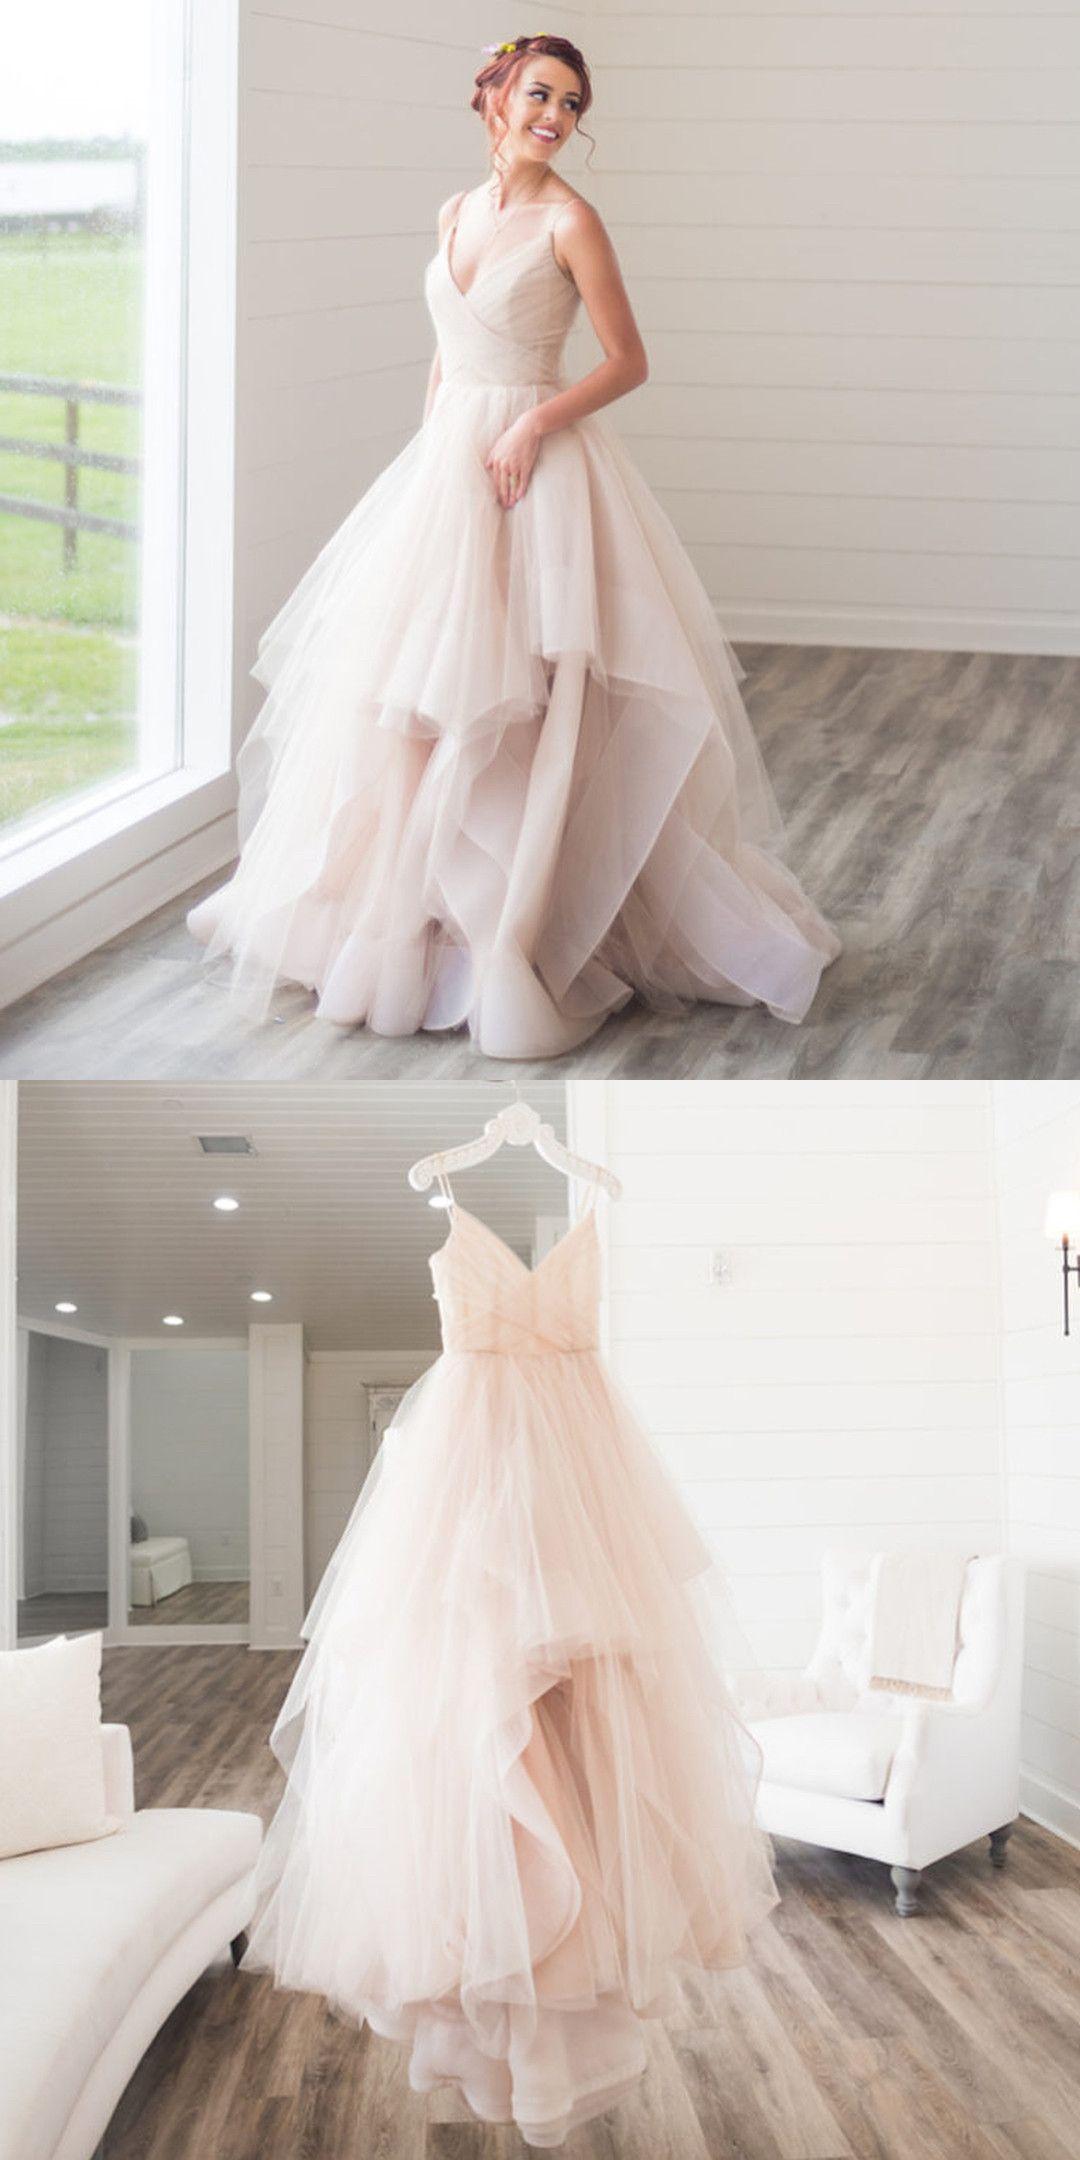 Bridal Gown Pink Long Wedding Dress Strapless Pink Long Wedding